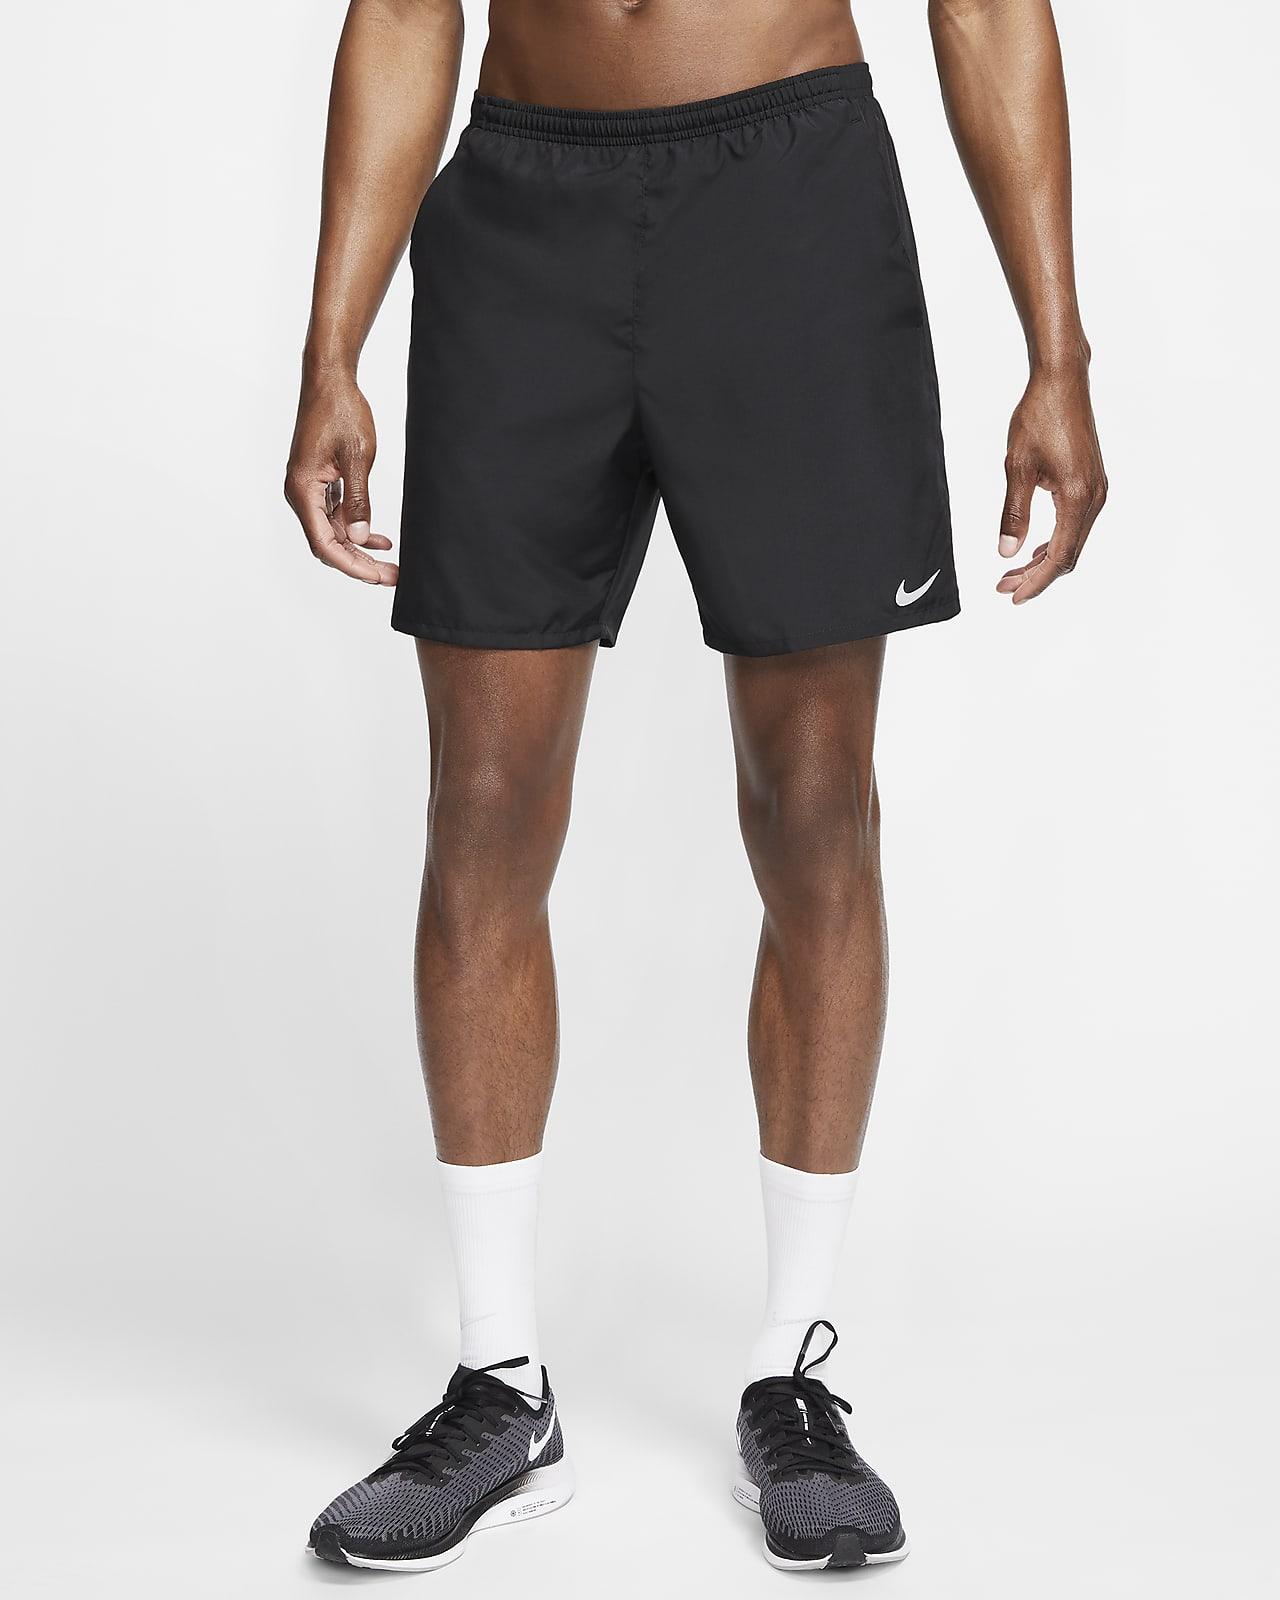 Löparshorts Nike Dri-FIT Run 18 cm för män